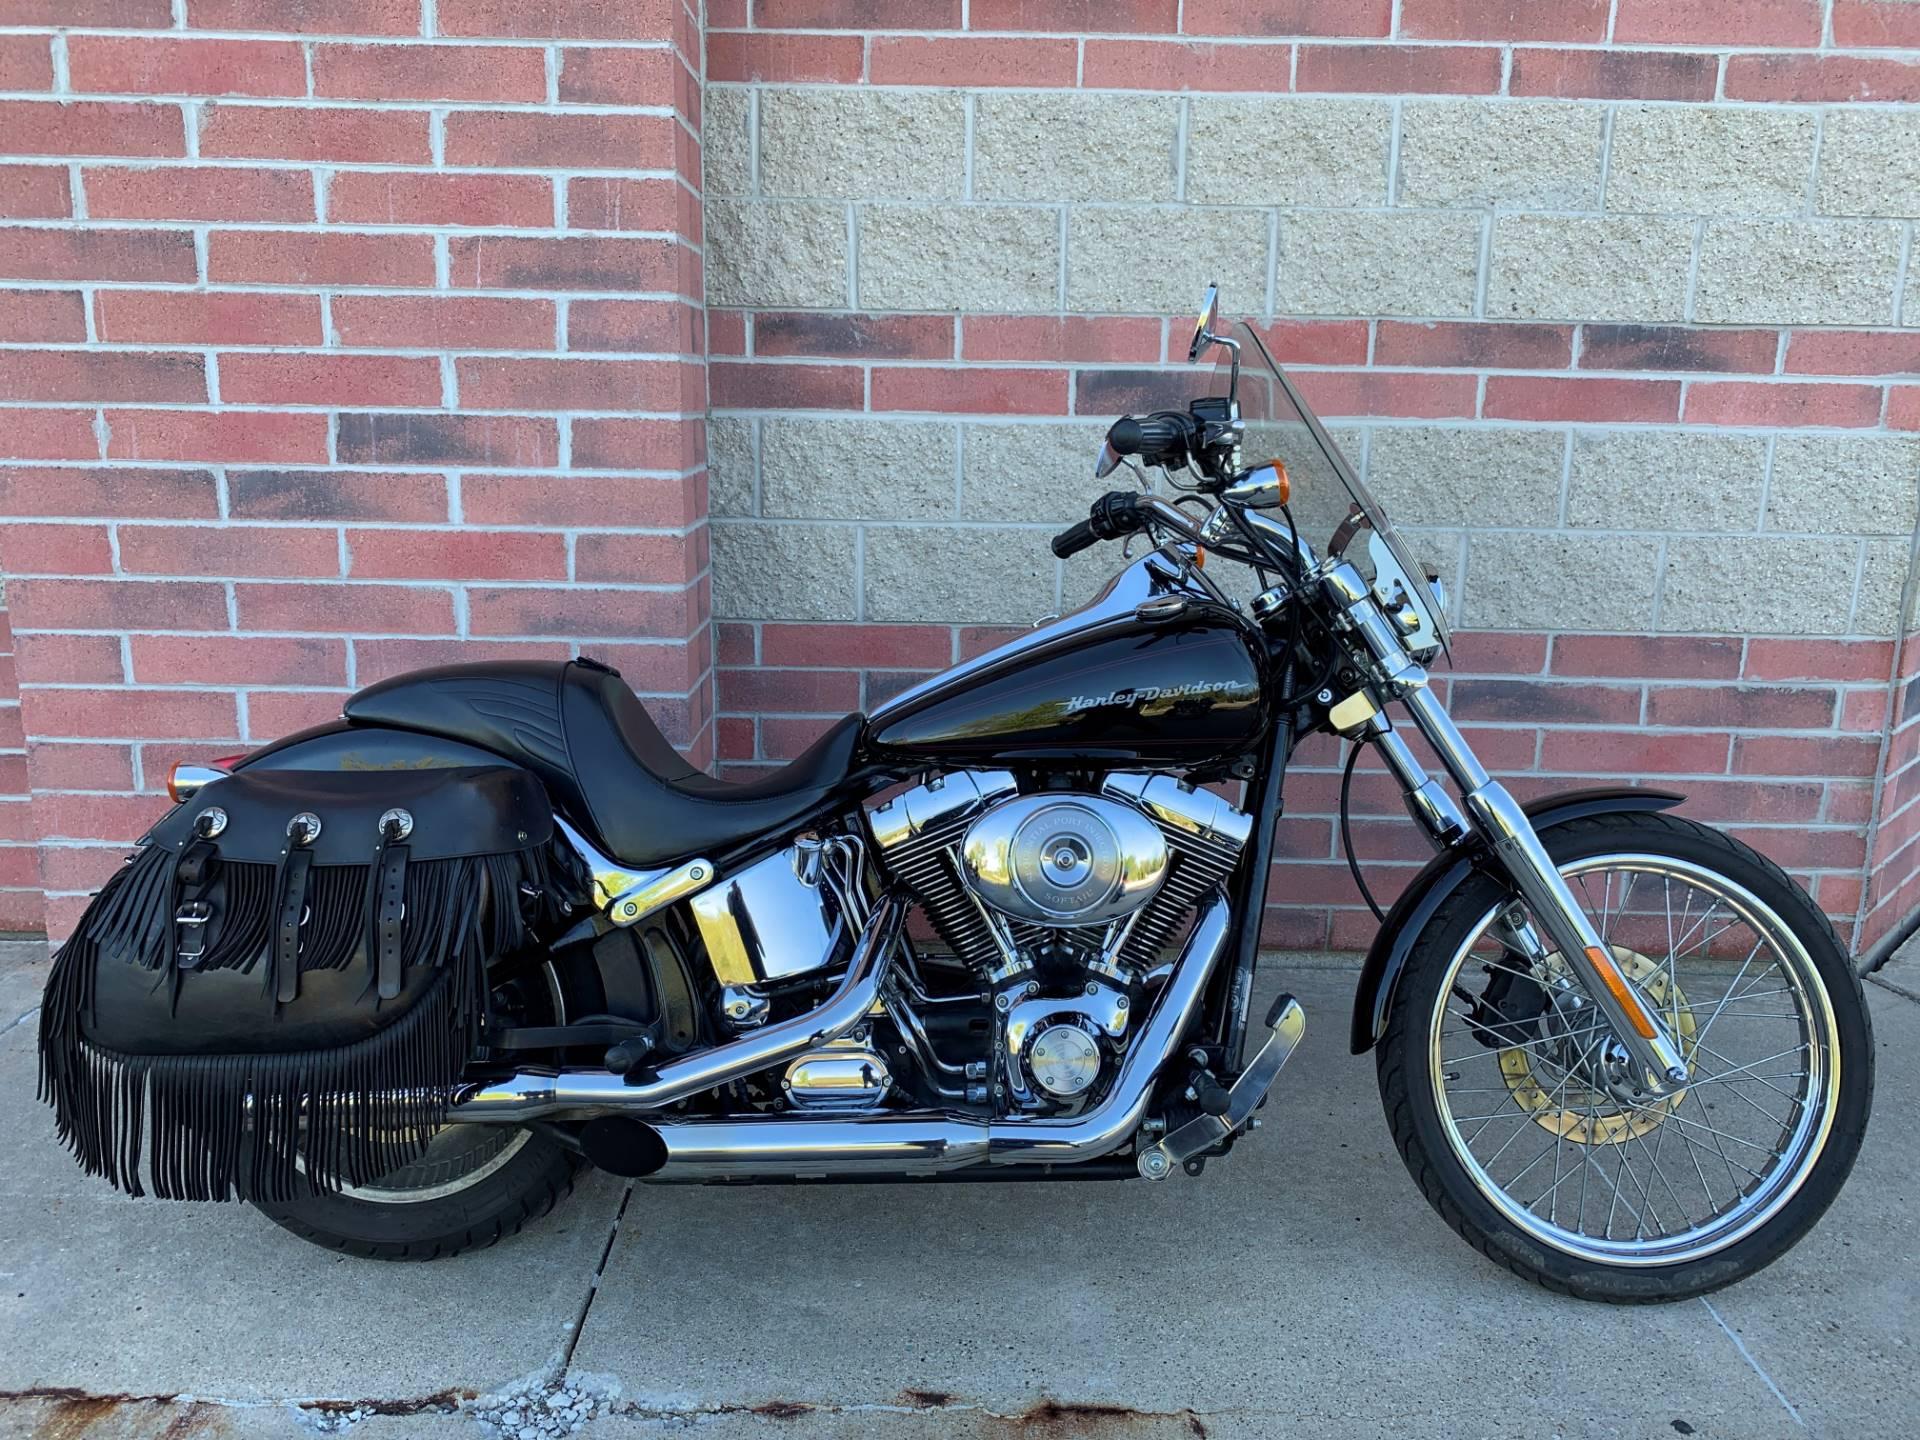 Harley Davidson Deuce >> Used 2001 Harley Davidson Softail Deuce Motorcycles In Muskego Wi